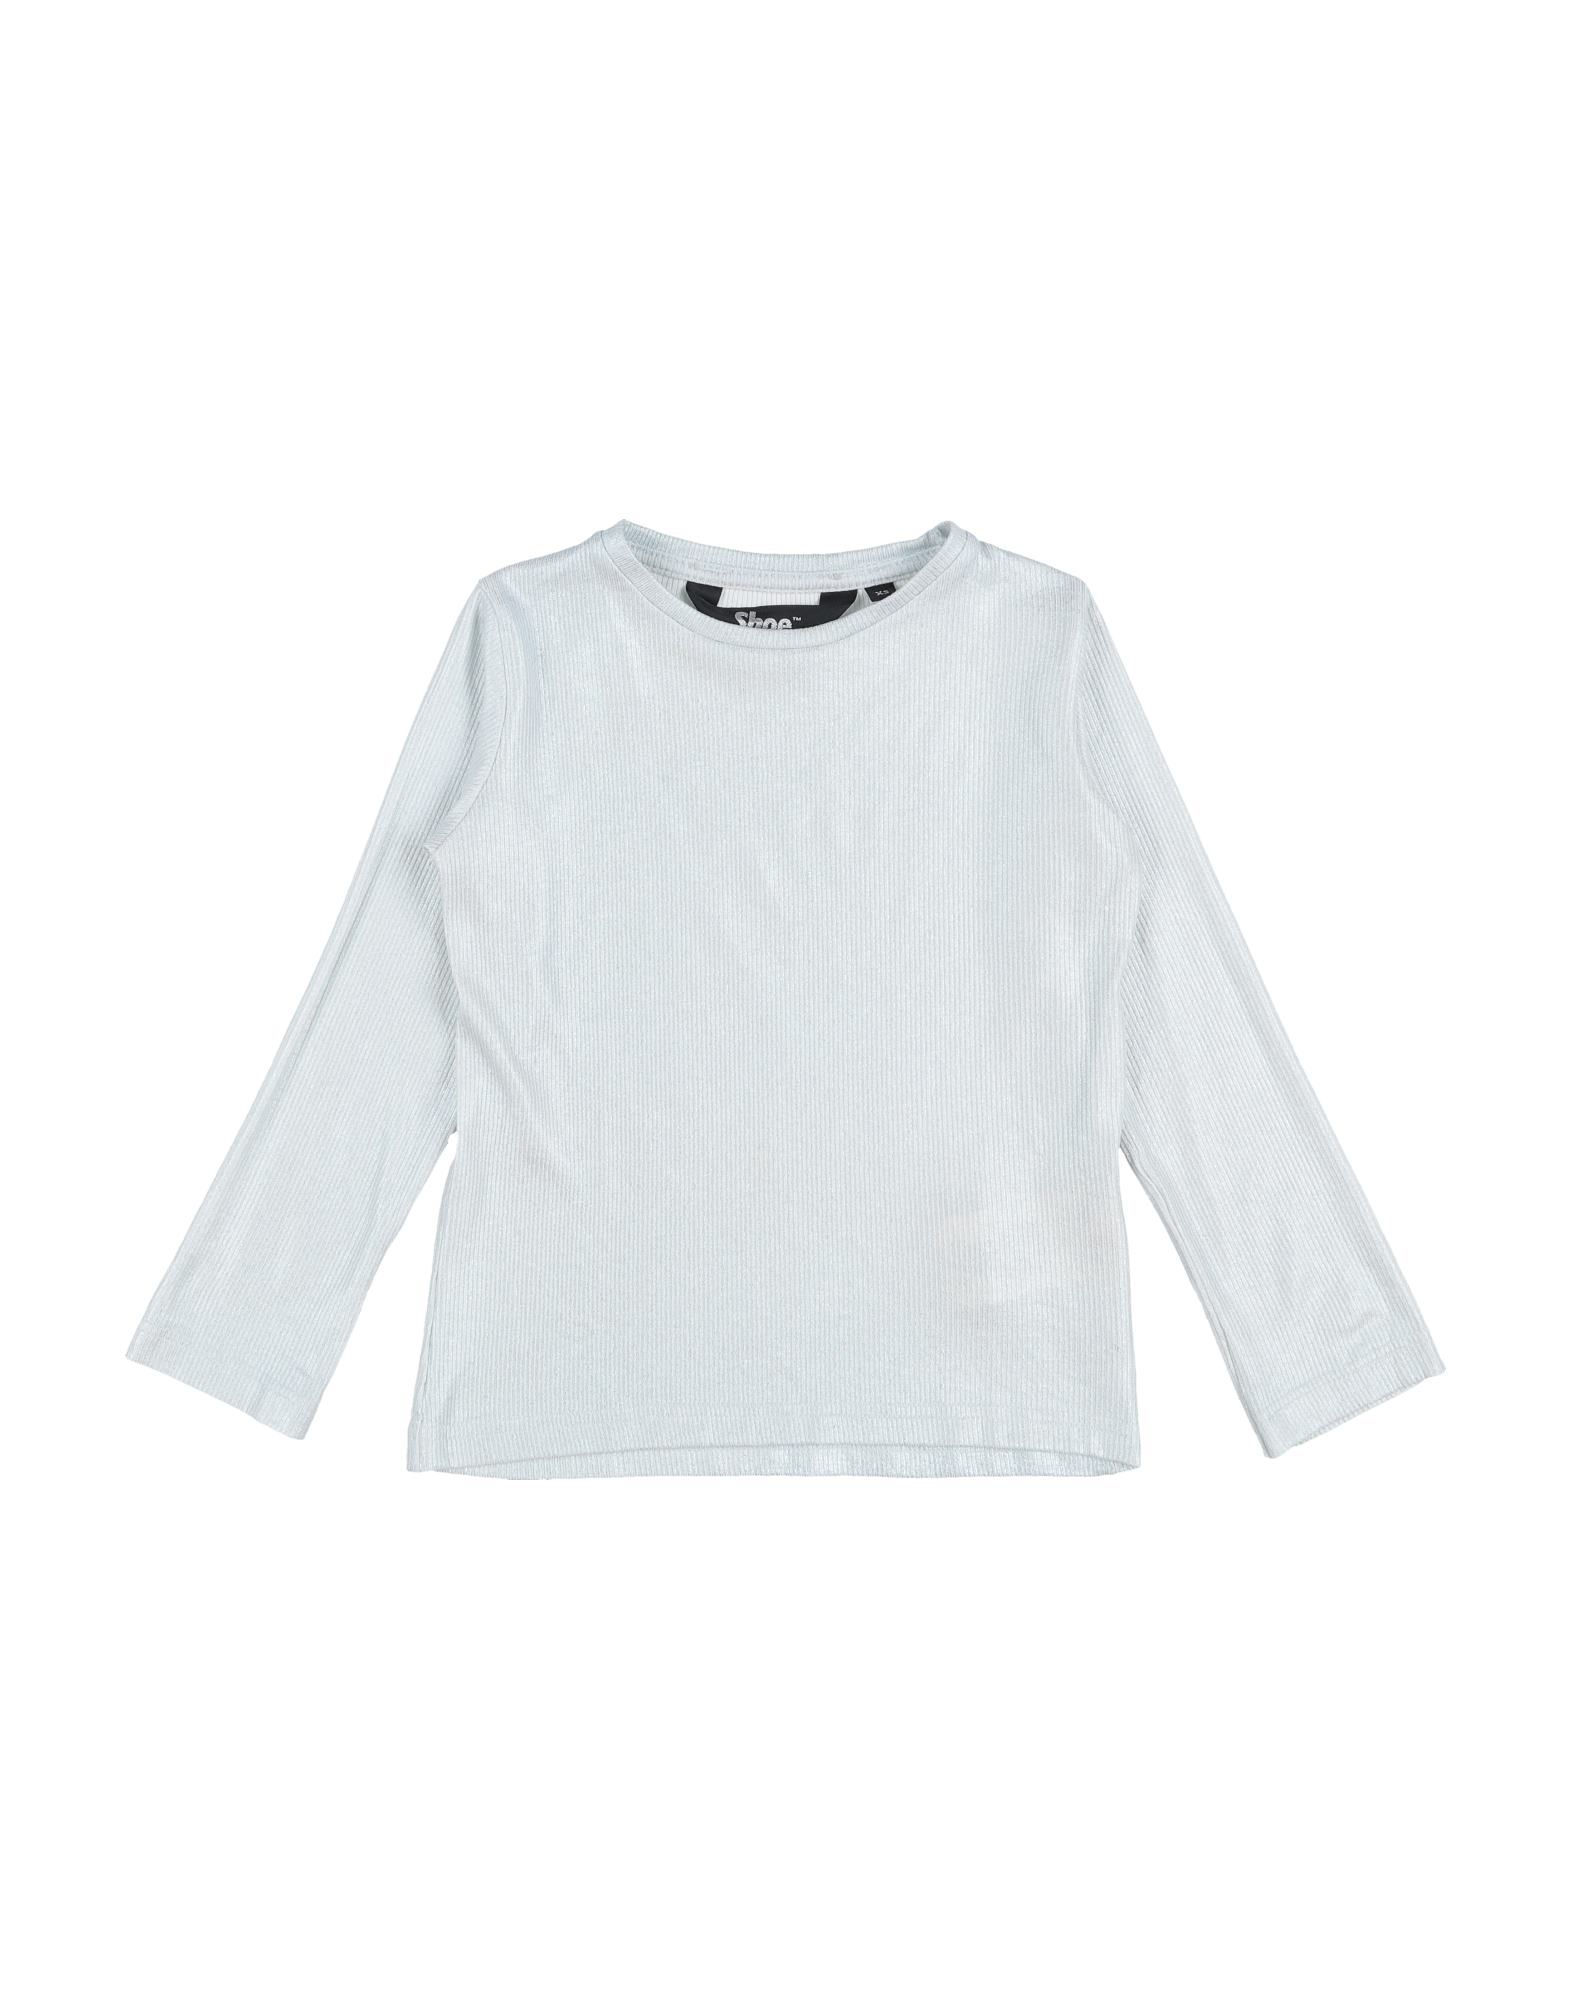 Shoeshine Kids' T-shirts In Light Grey